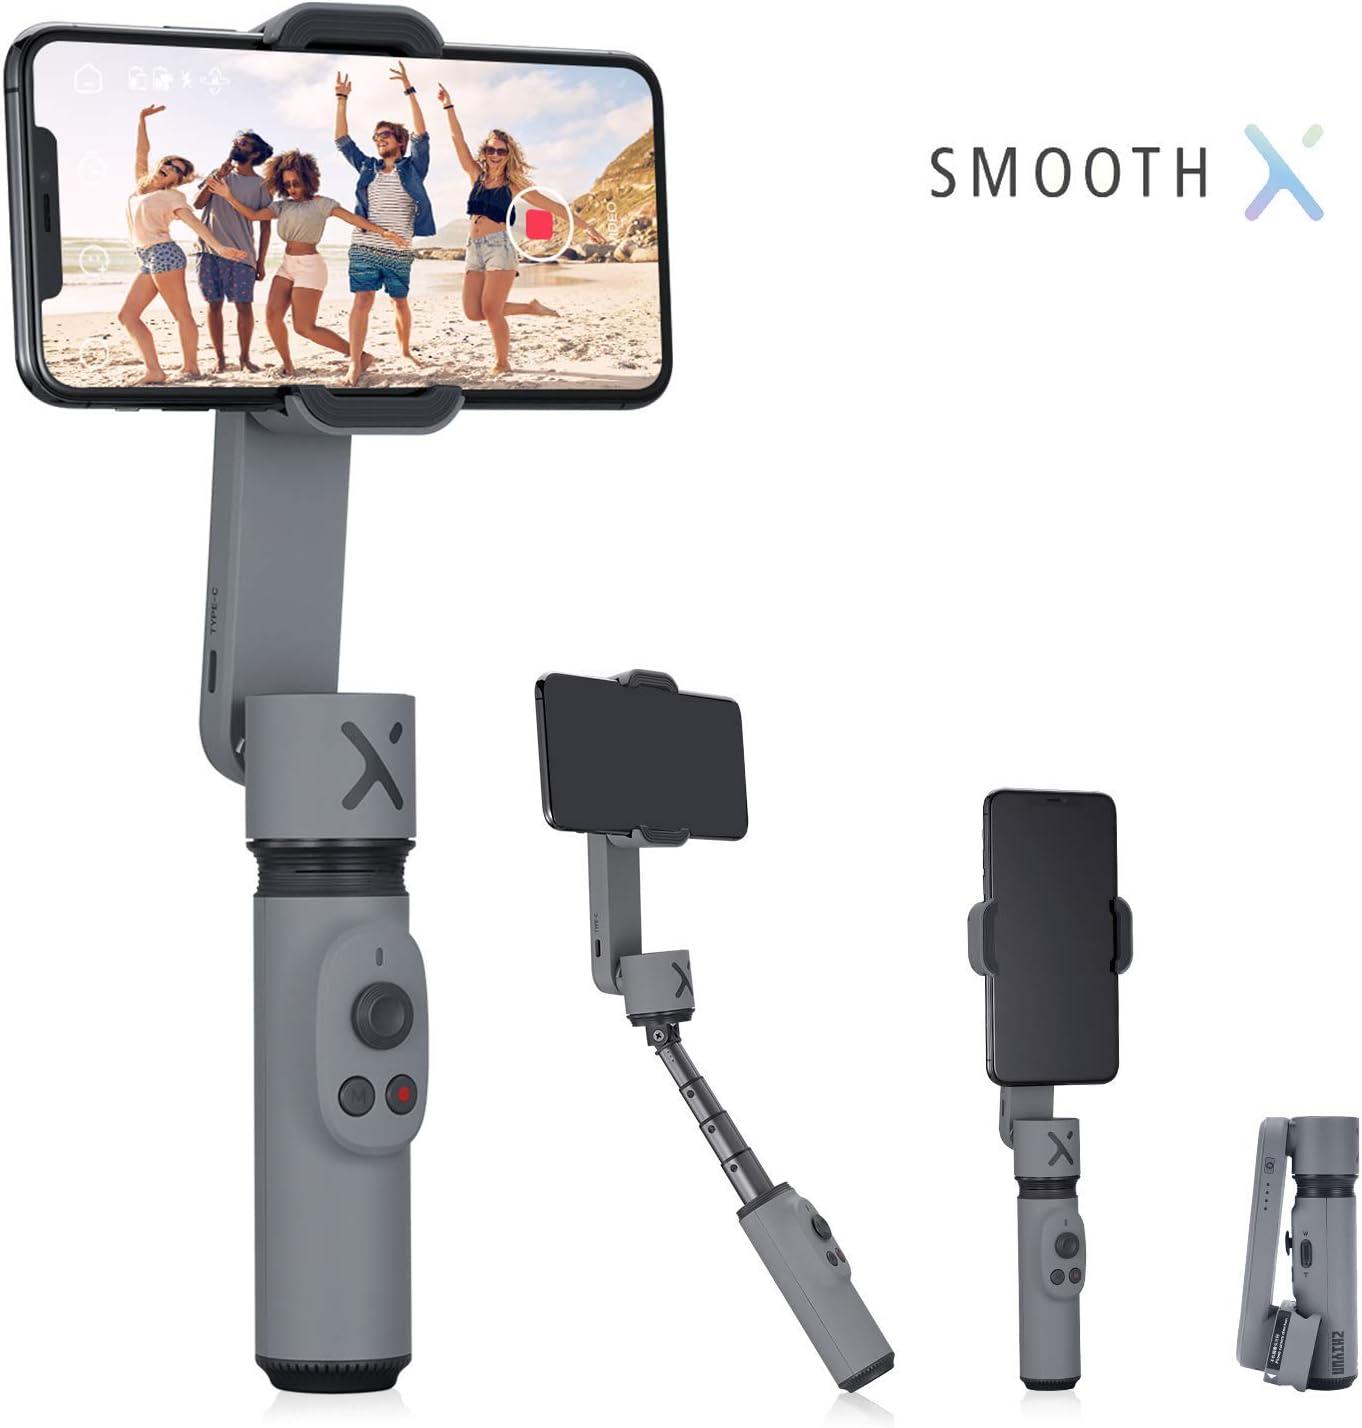 Zhiyun Smooth X 2 ejes estabilizador card/án para iPhone 11 Pro Xs Max Xr X 8 Plus 7 6 SE Smartphone Android Samsung Galaxy Note10 S10